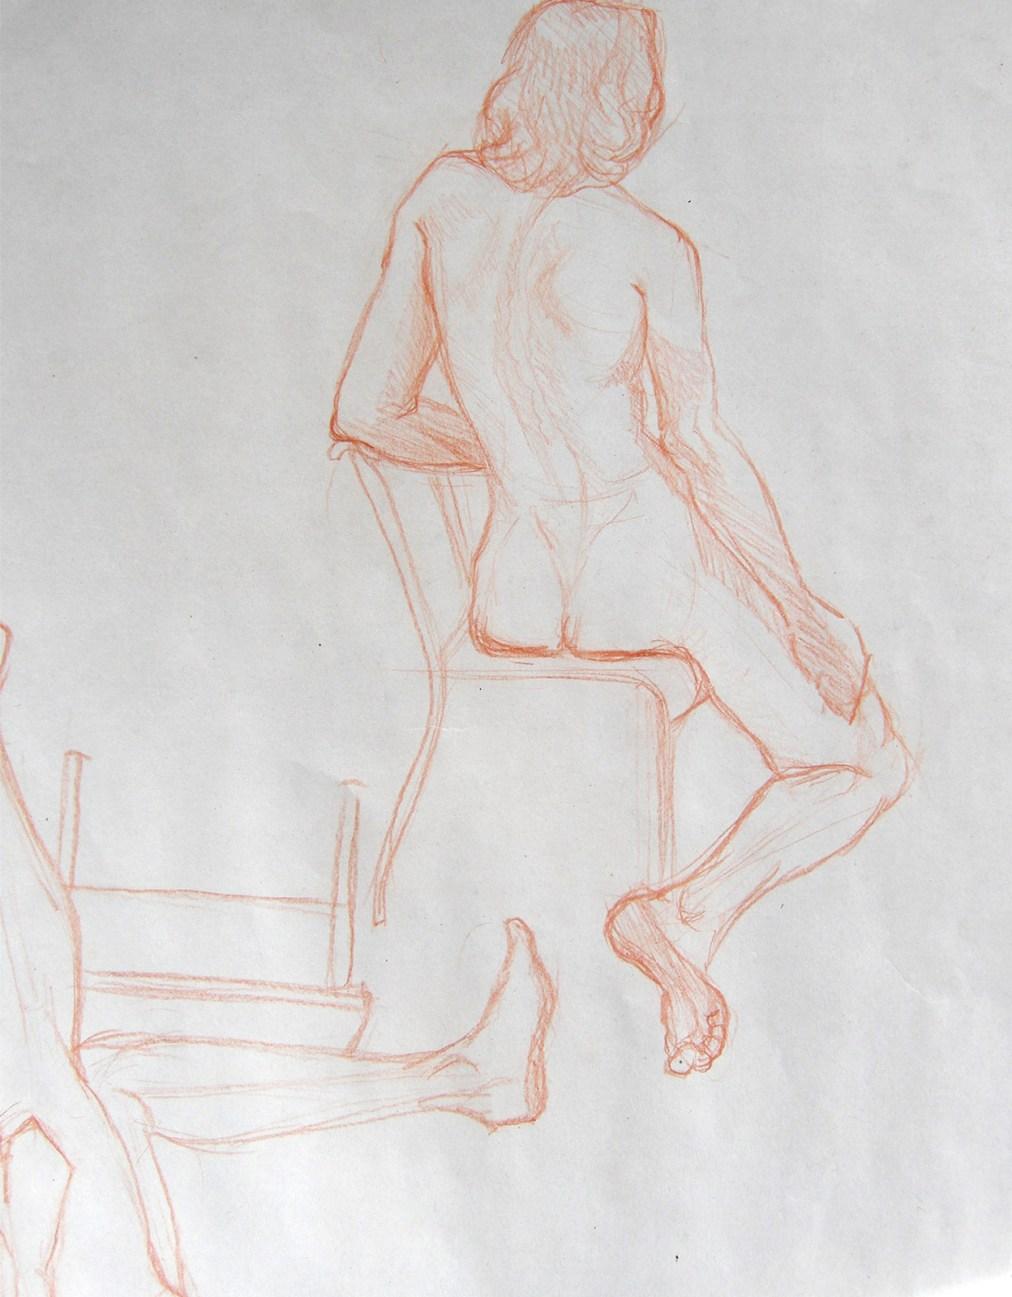 Quick pencil studies by Tatyana Deniz, pencil on paper, 2011